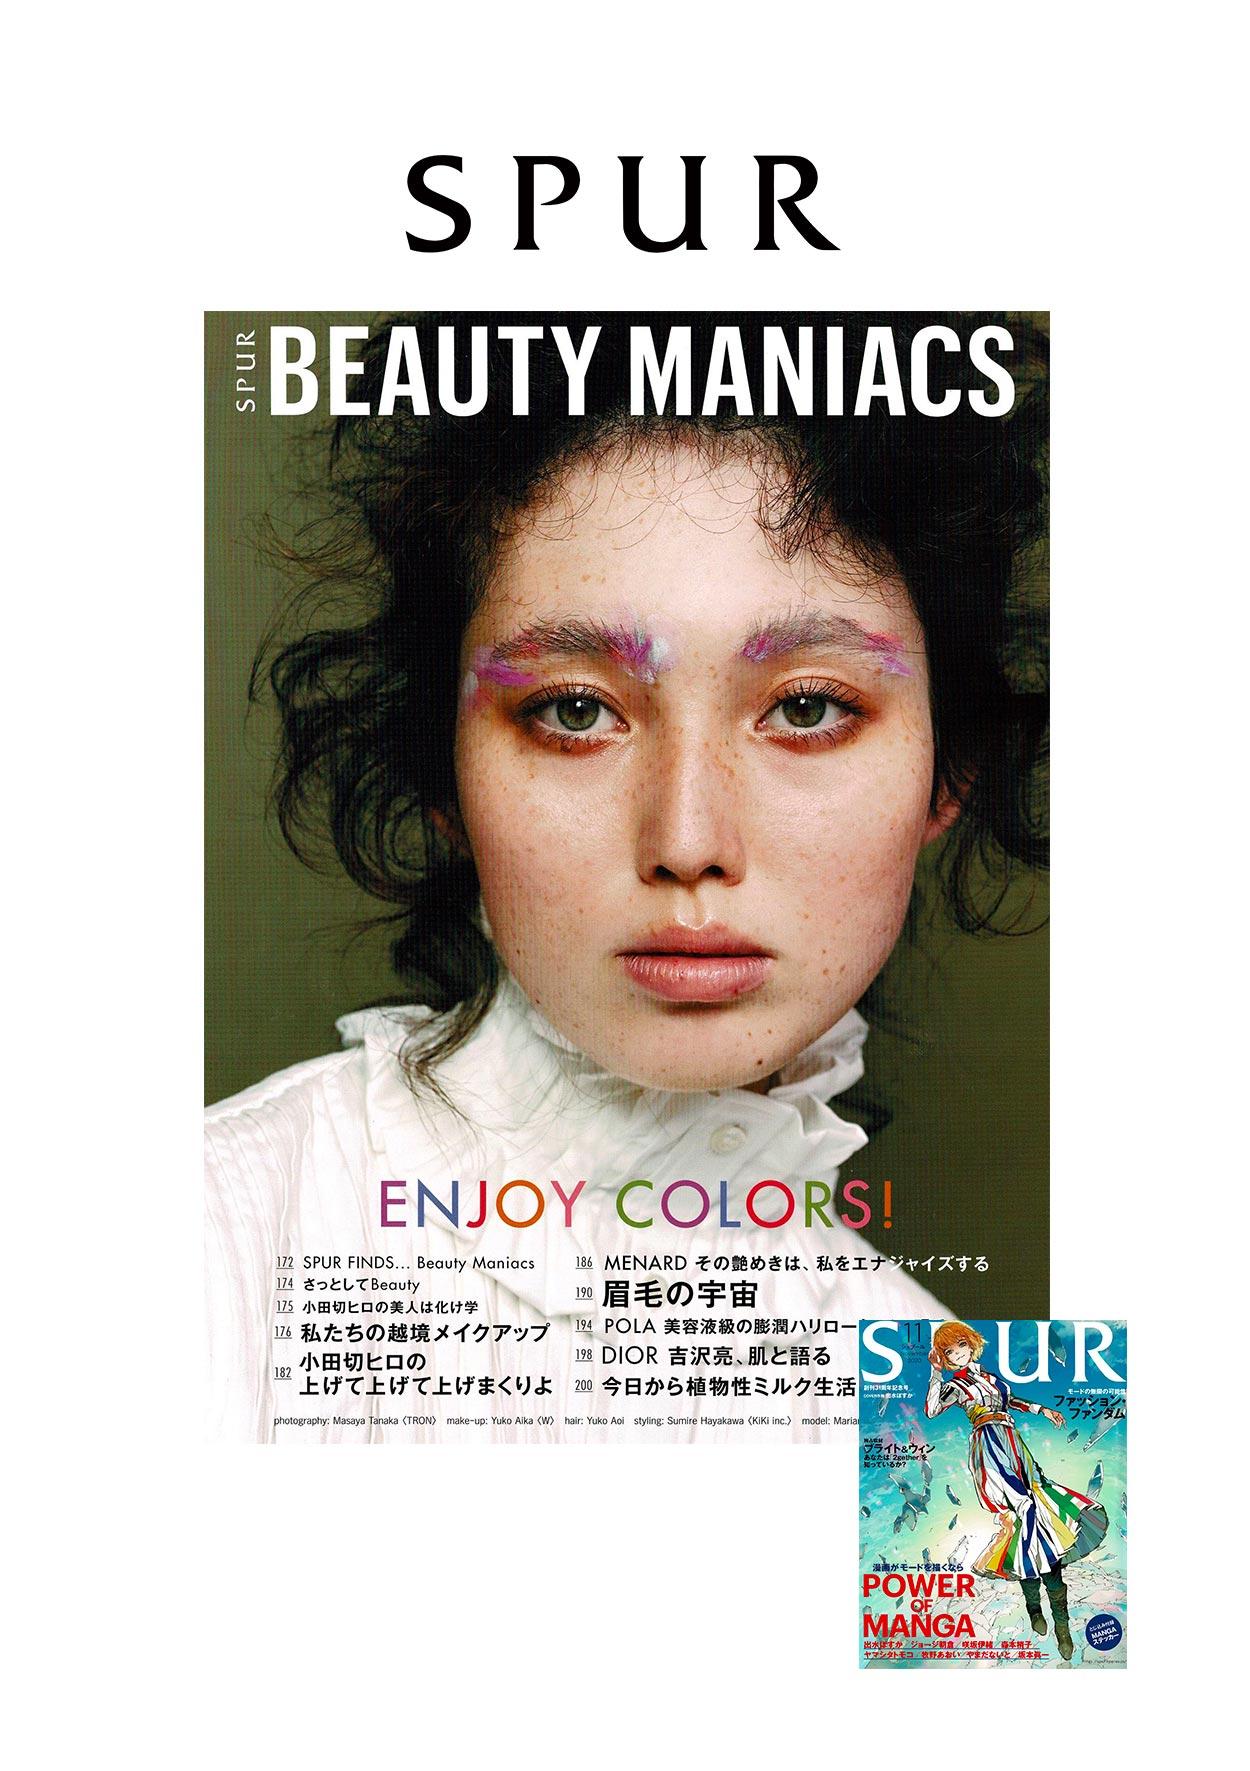 melampo press on spur Japan magazine - photo 1